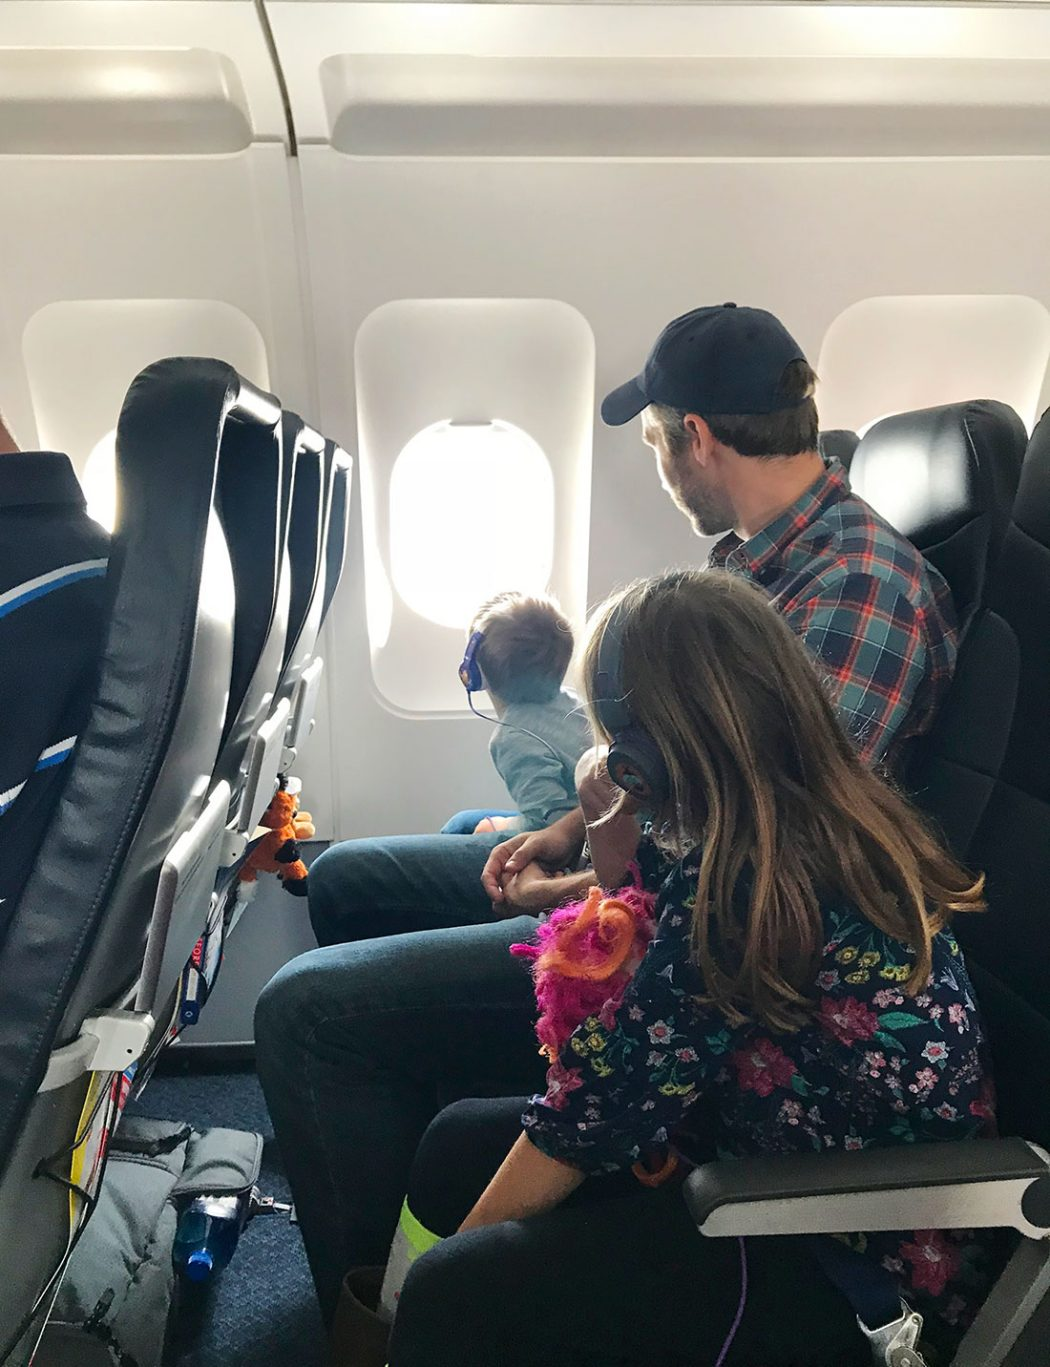 John and kids on plane to spring break in florida